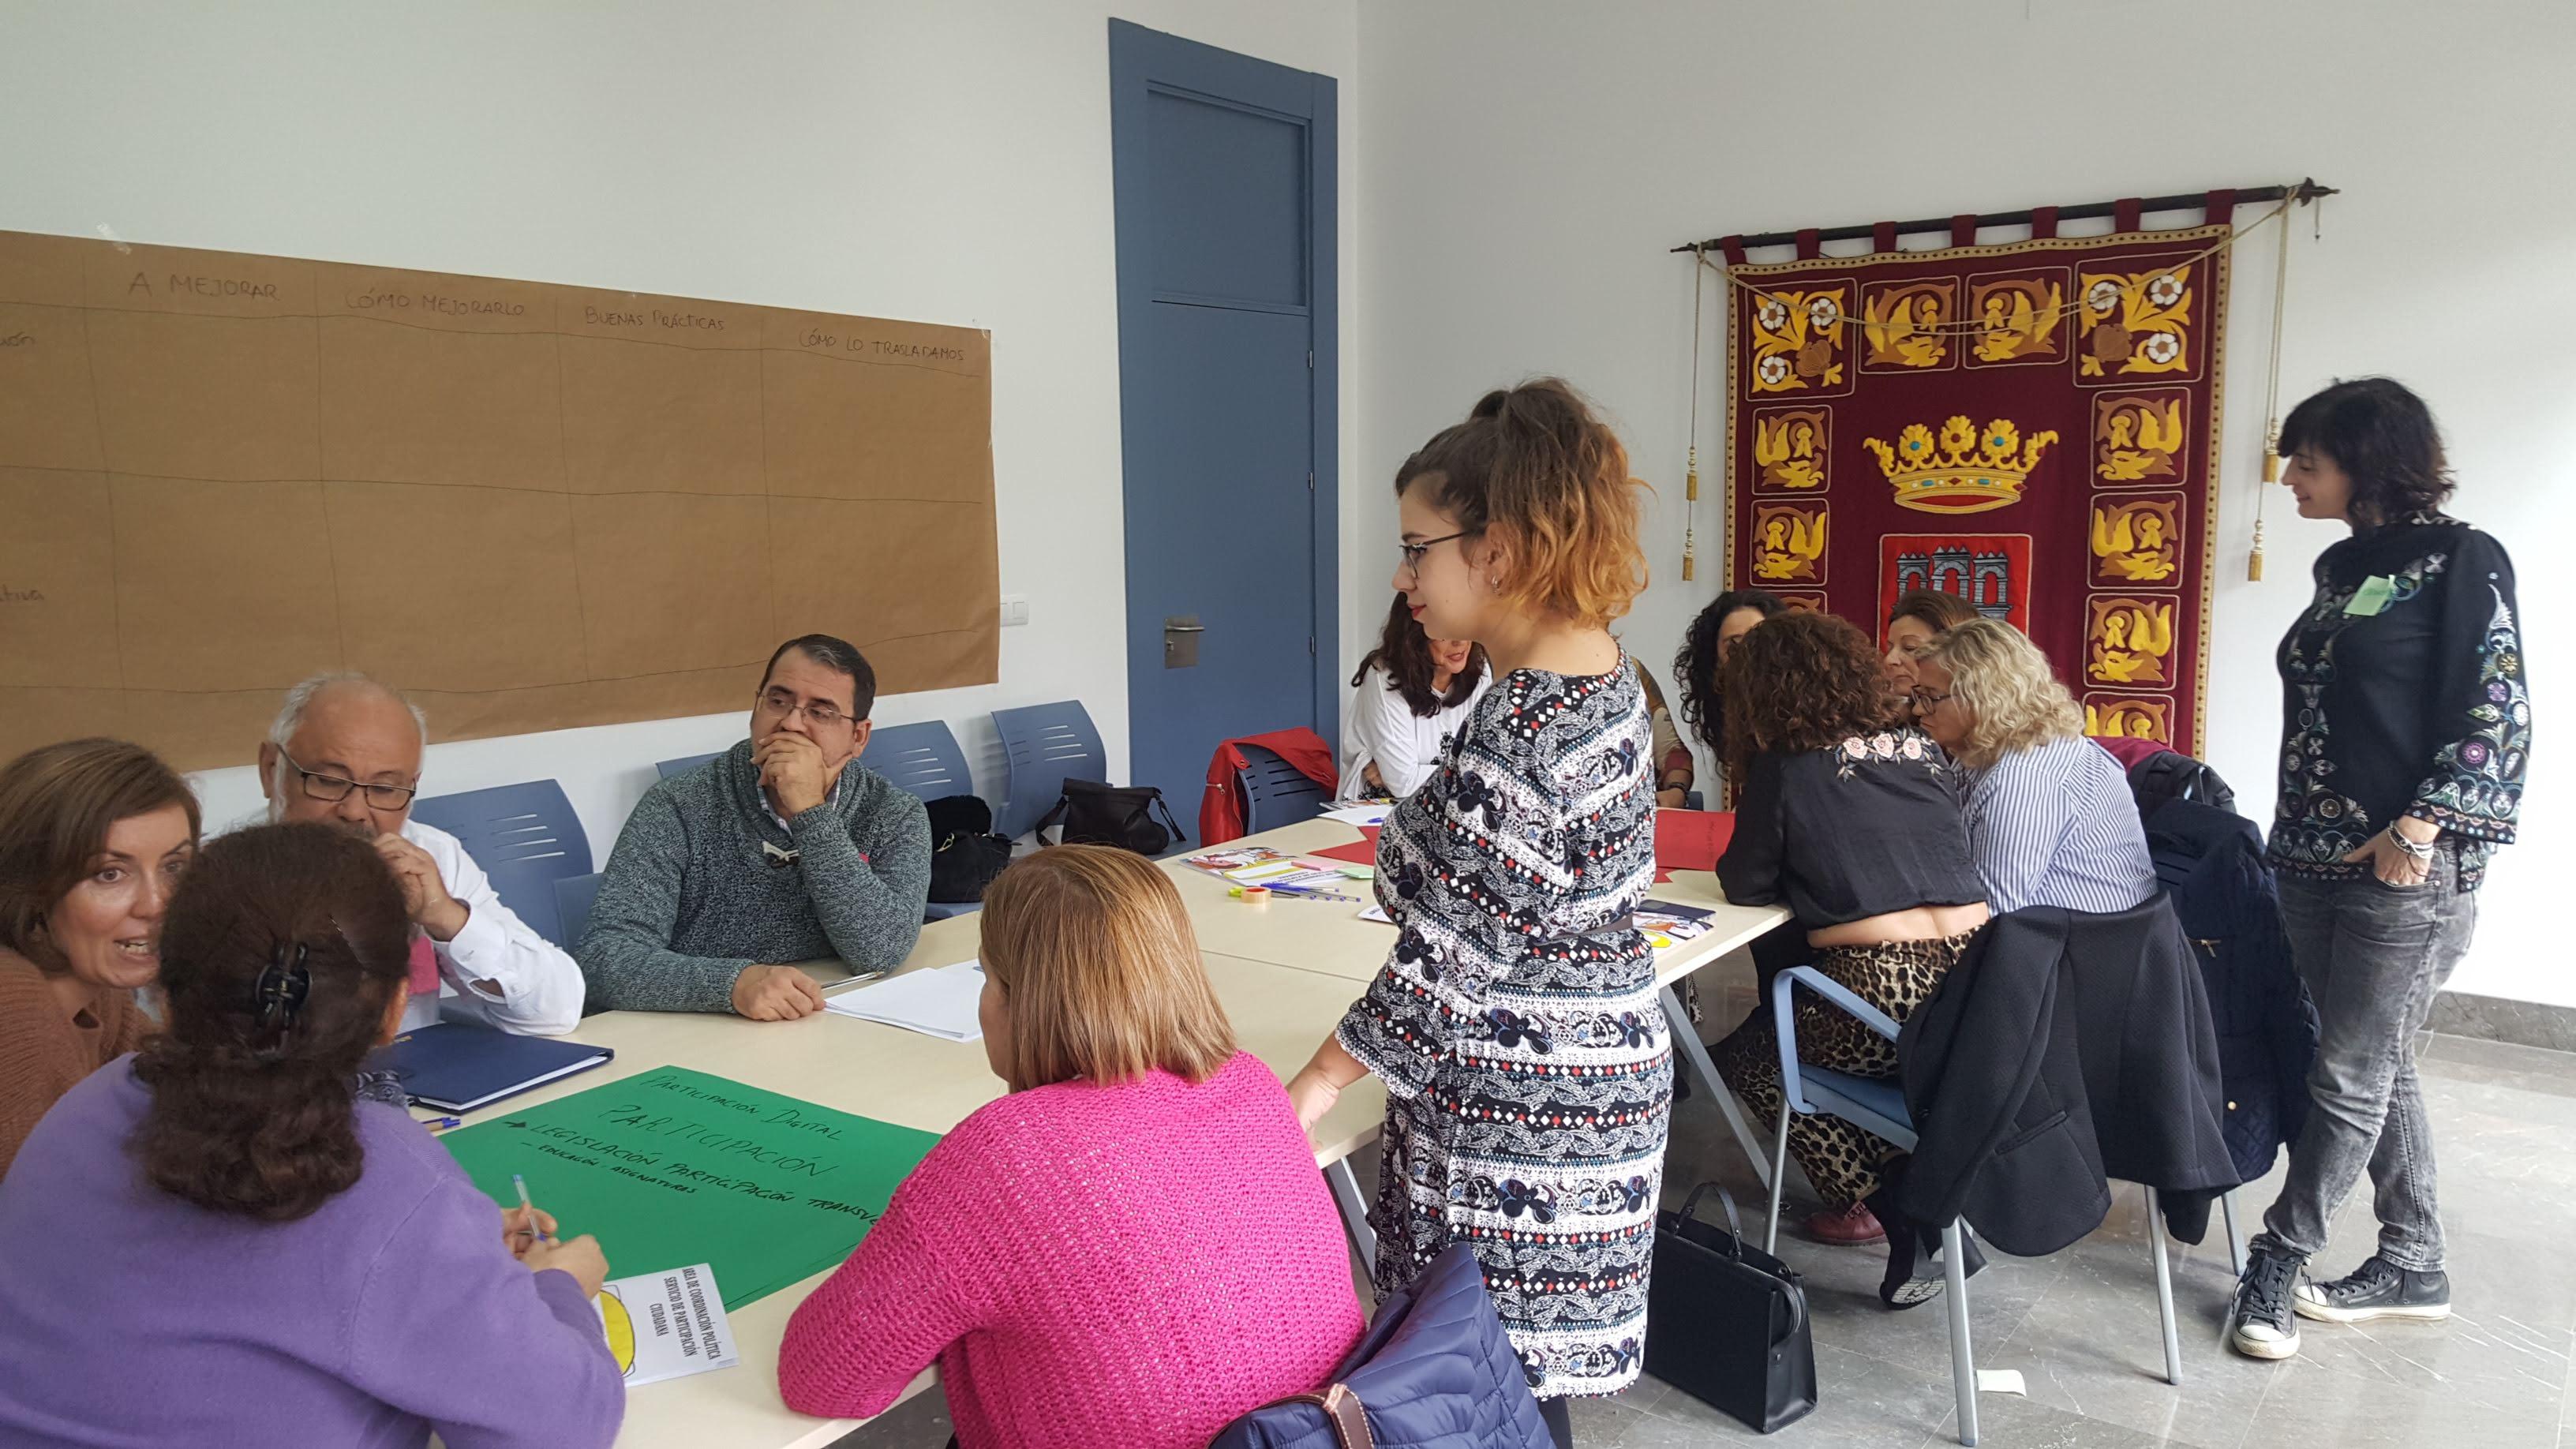 Imagen de la meotodología EASW – European Awareness Scenario Workshops